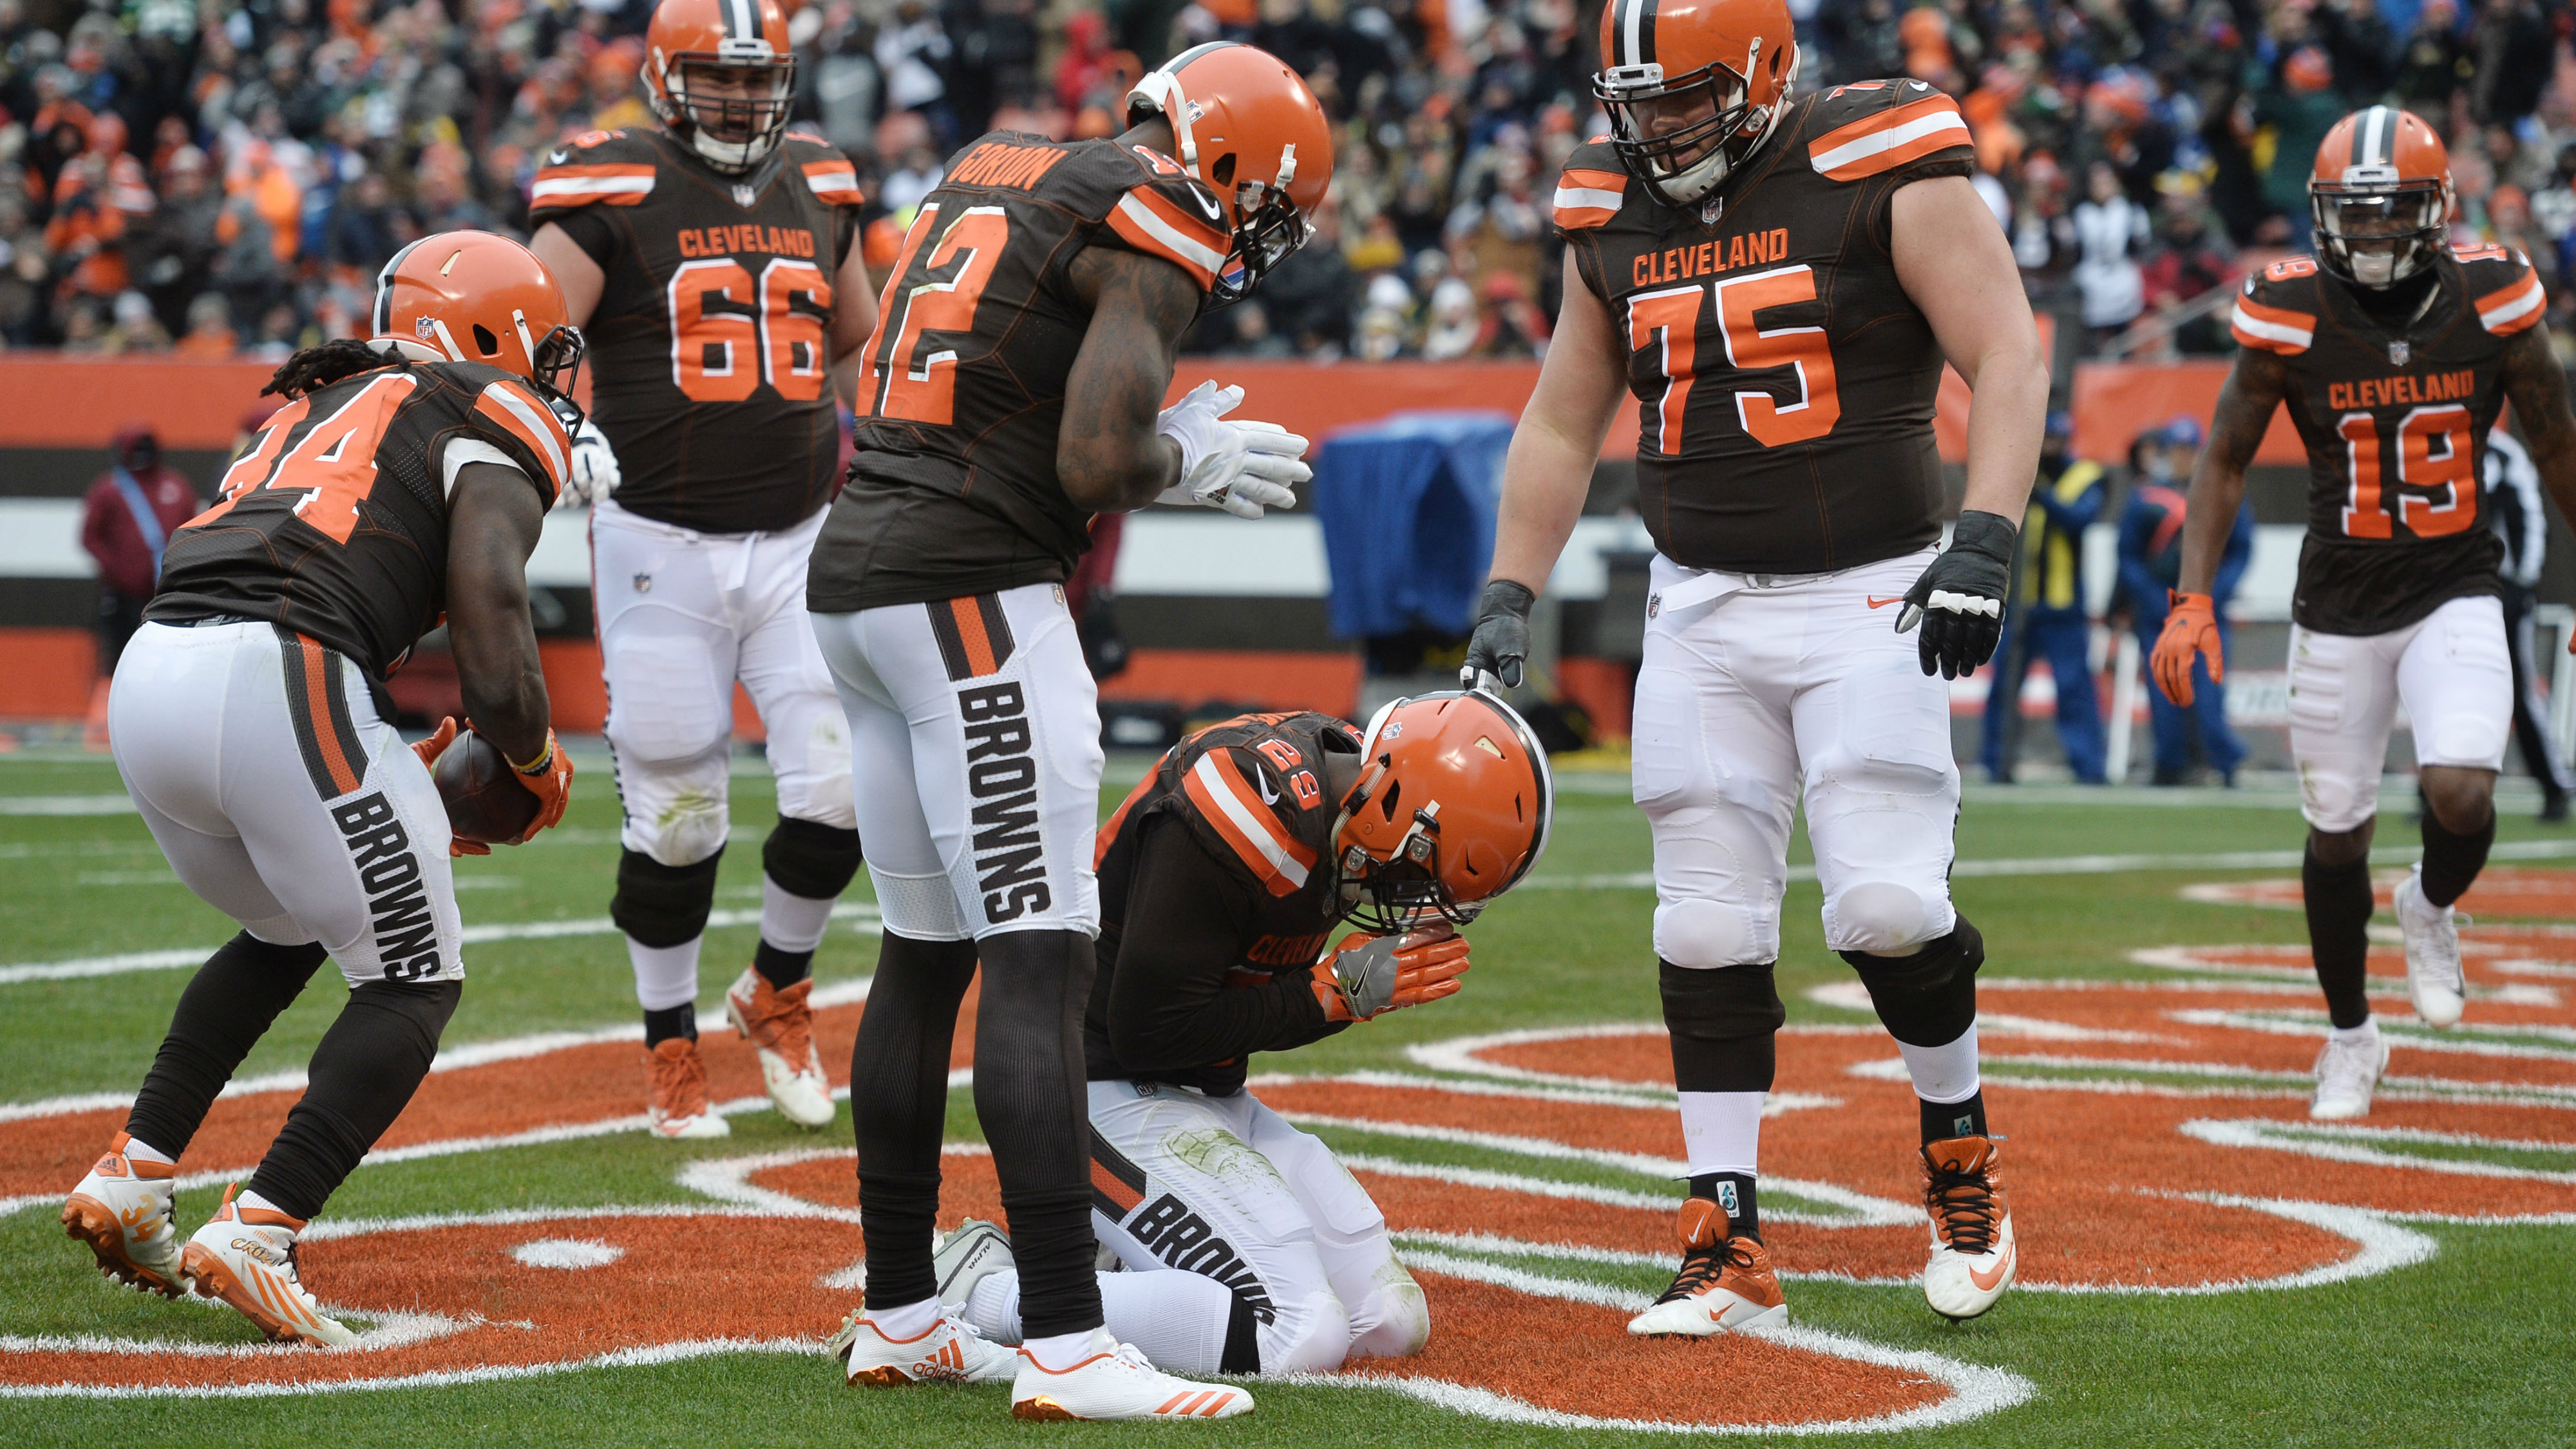 A football player praying after scoring a